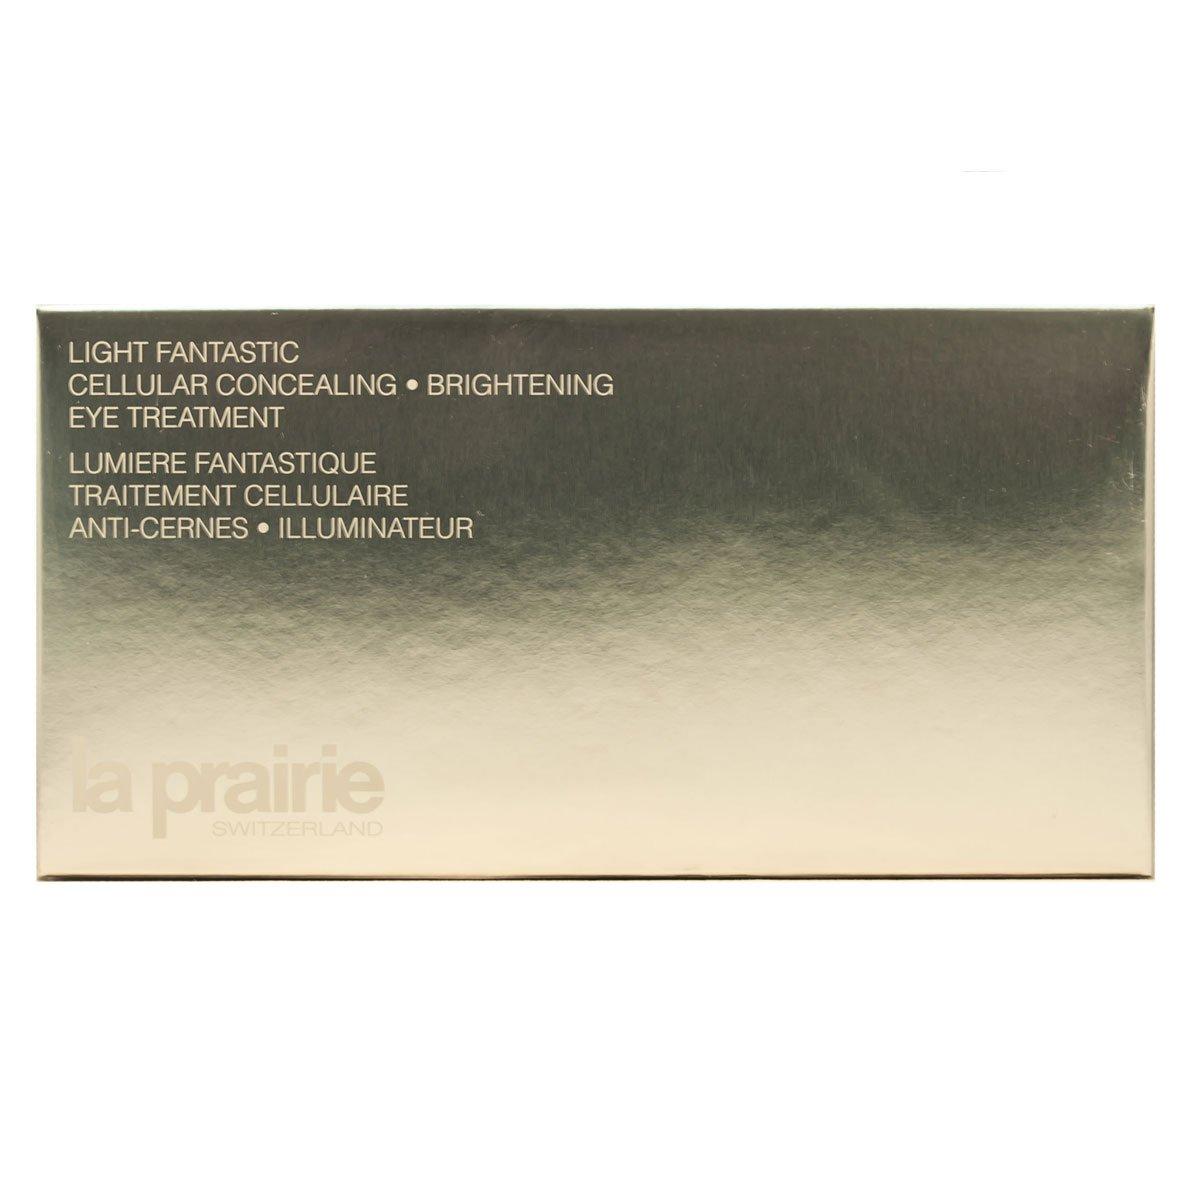 La Prairie Light Fantastic Cellular Concealing Brightening Eye Treatment for Unisex, # 10, 2 Count